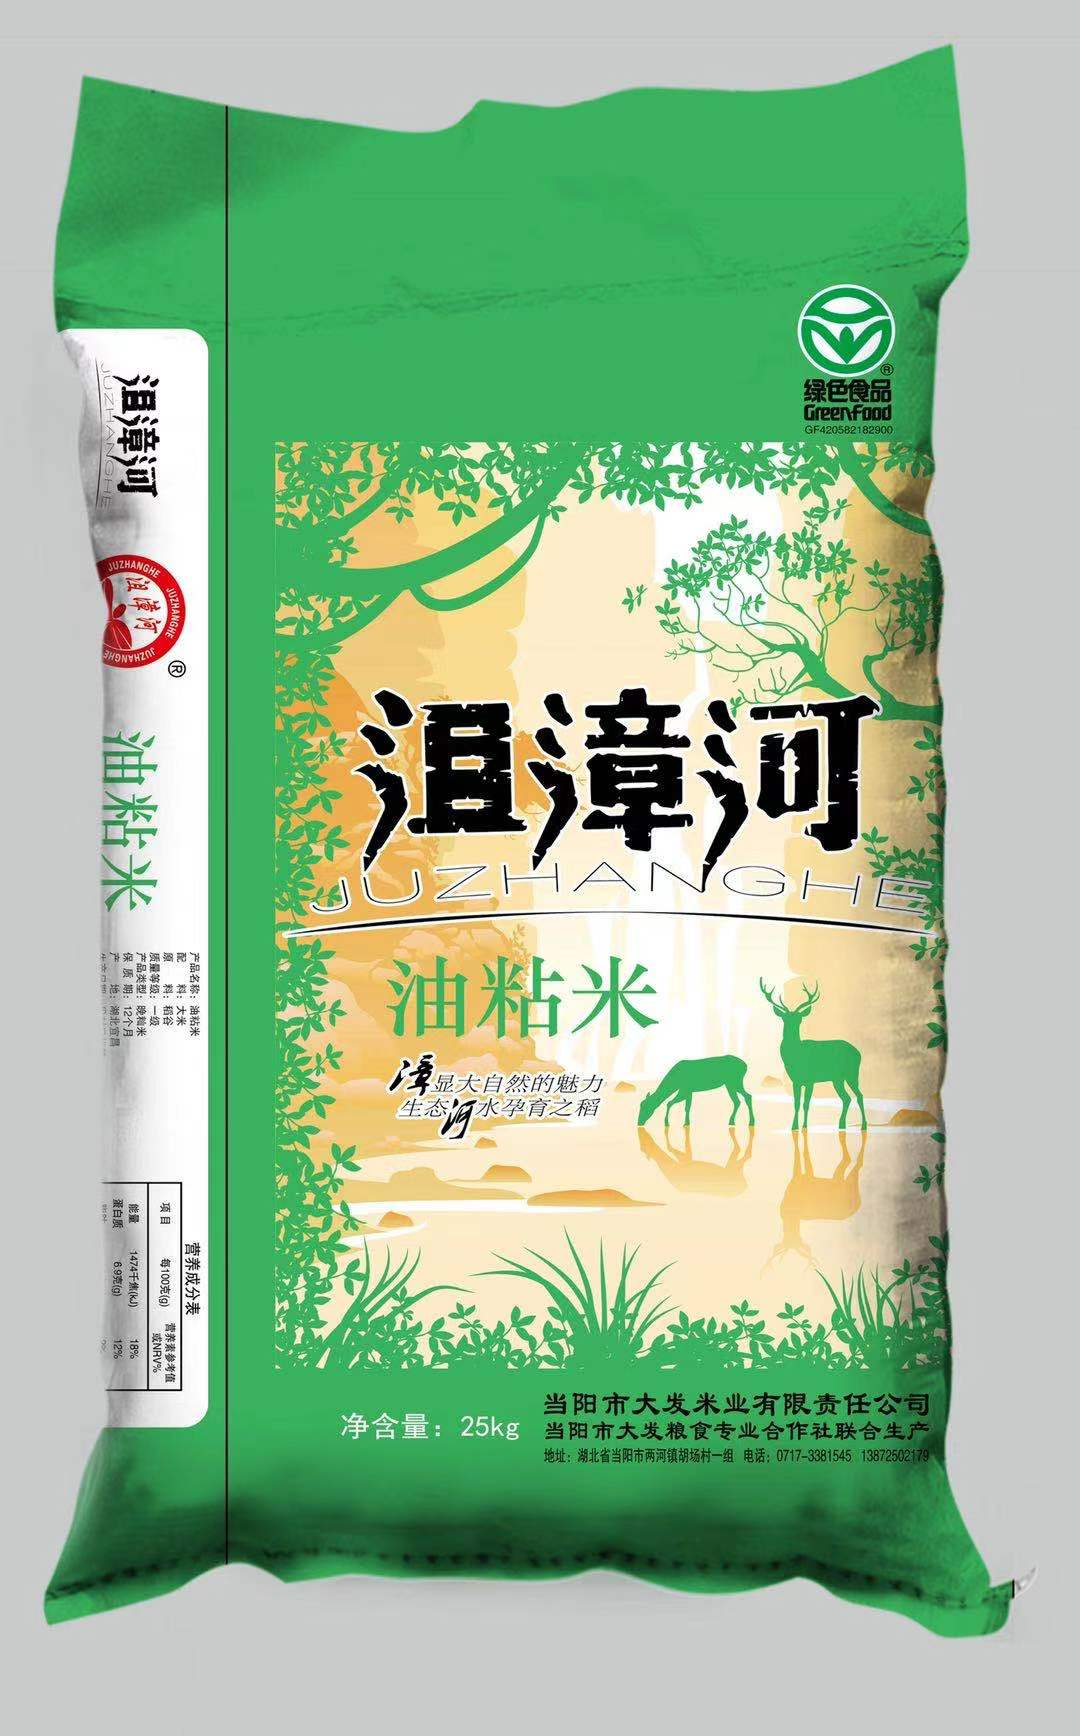 25kg包装沮漳河油粘米上市